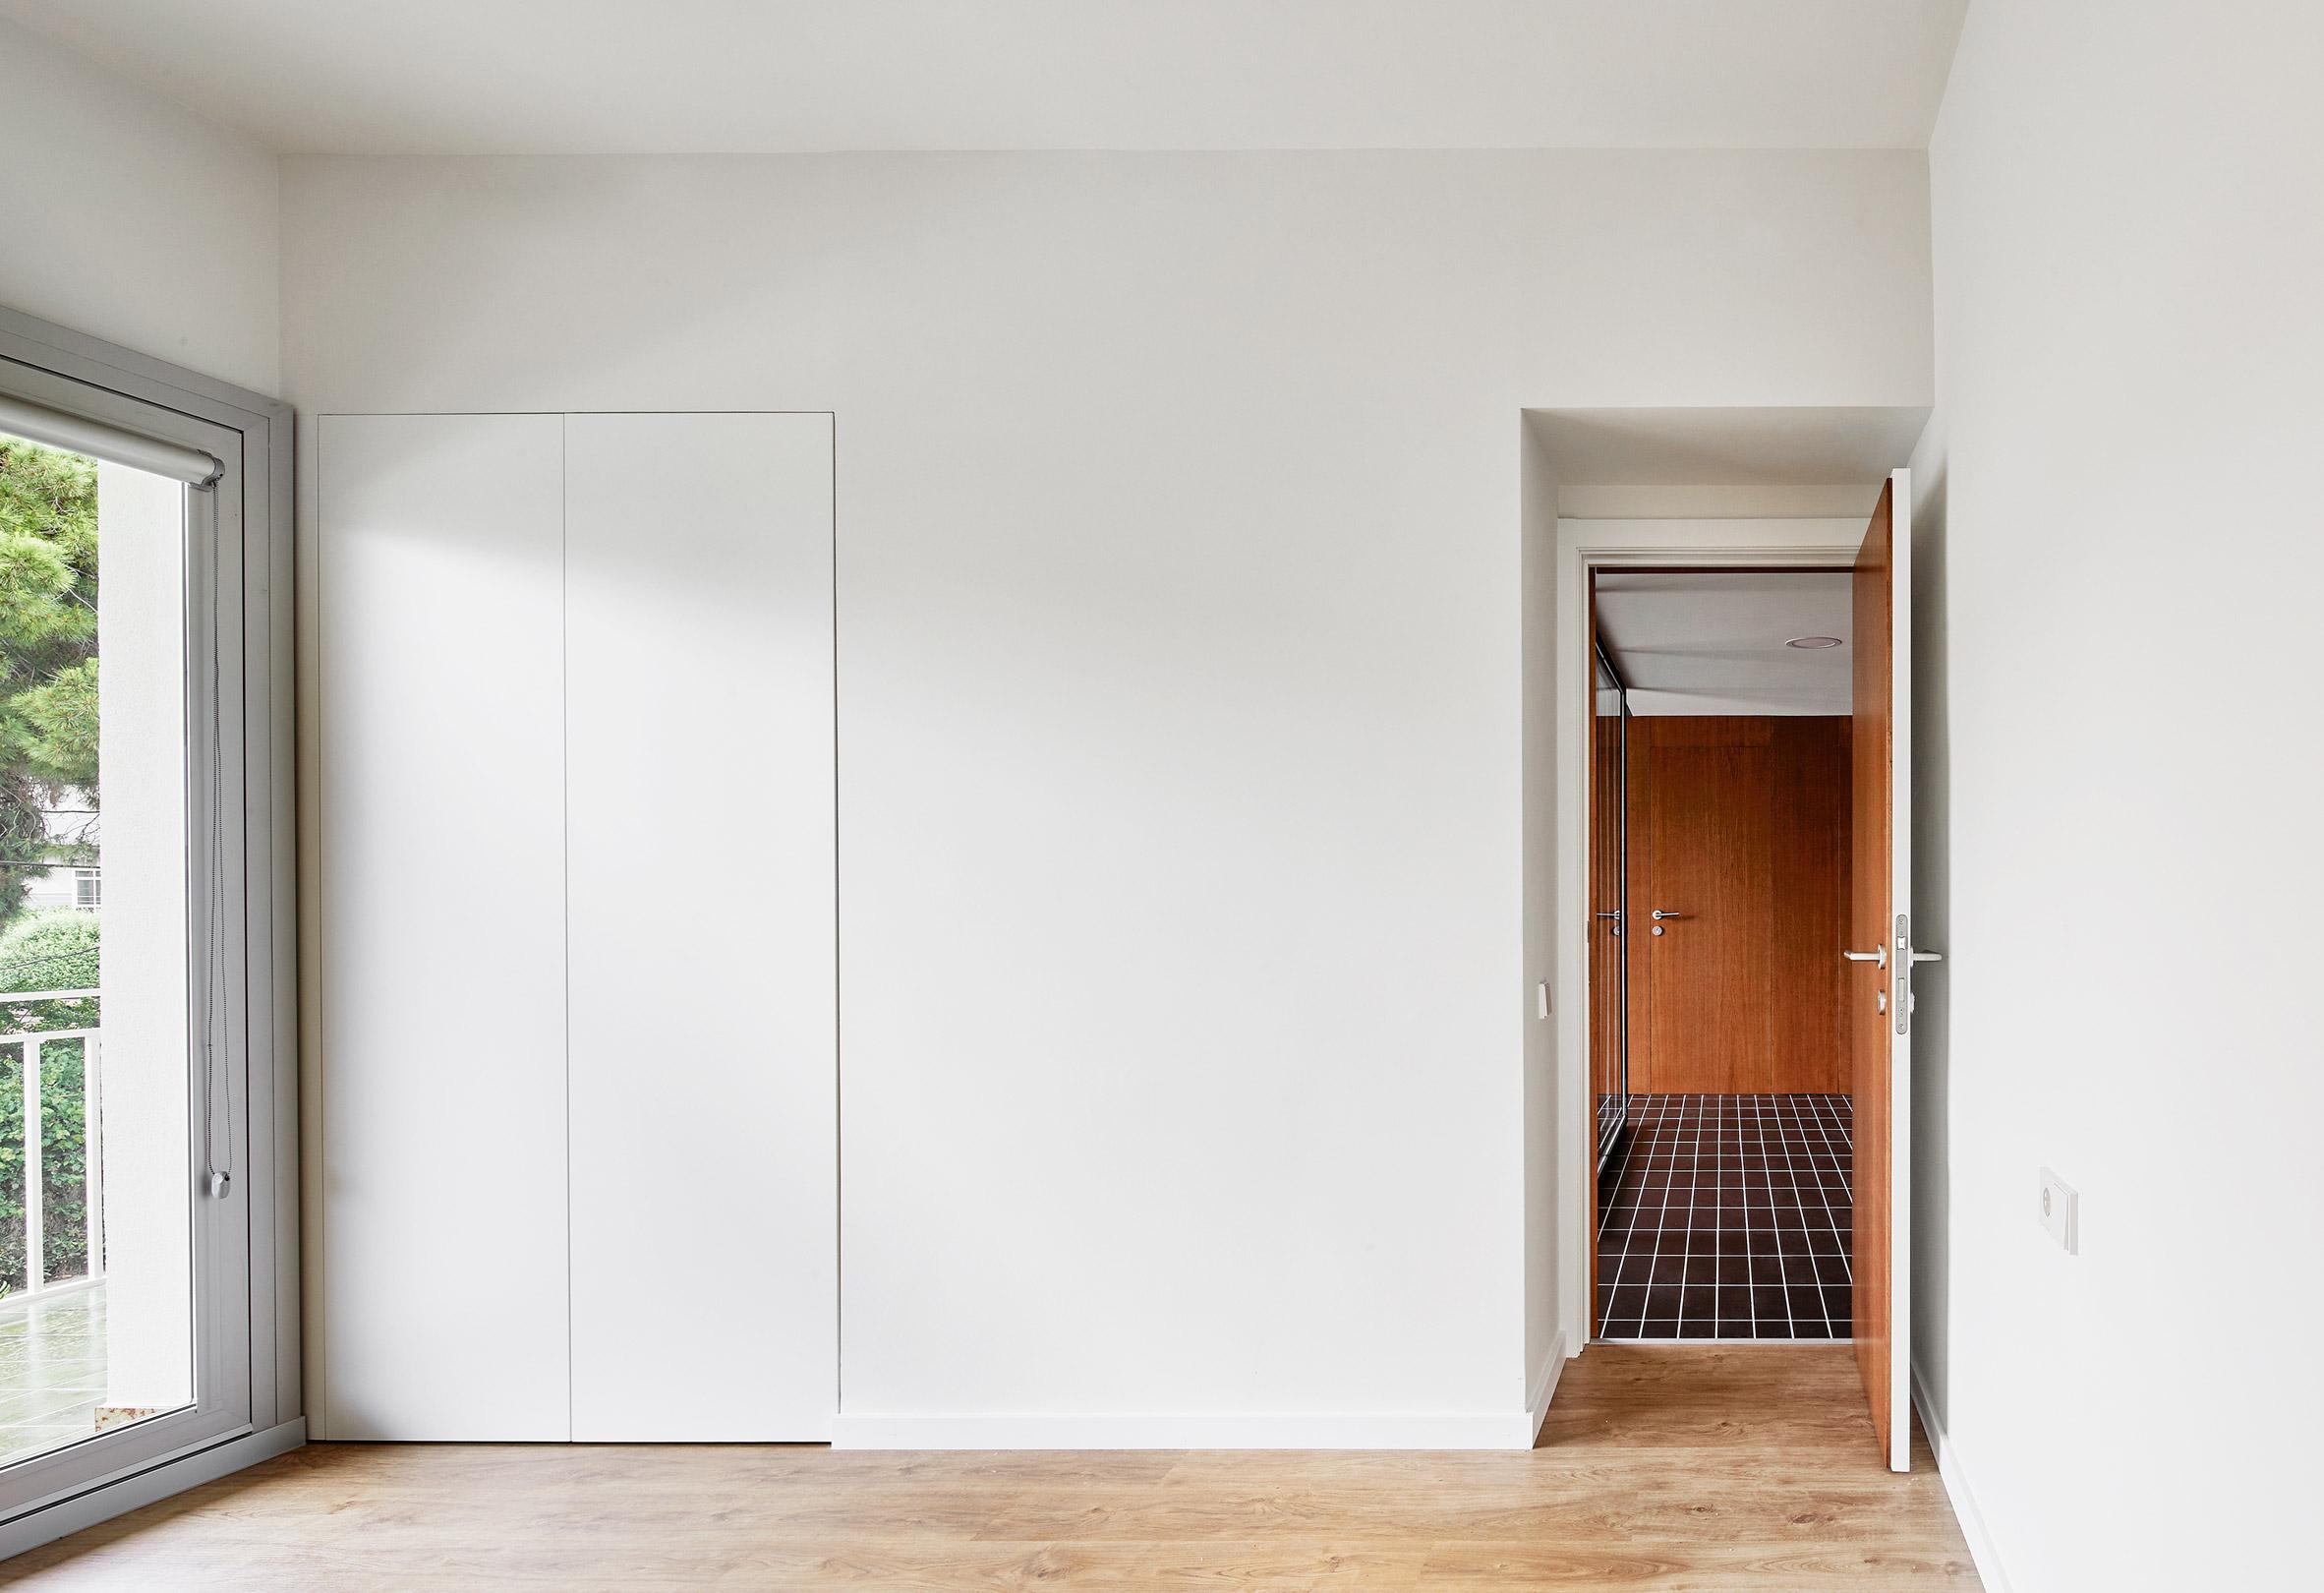 house-106-raul-sanchez-interiors_dezeen_2364_col_13